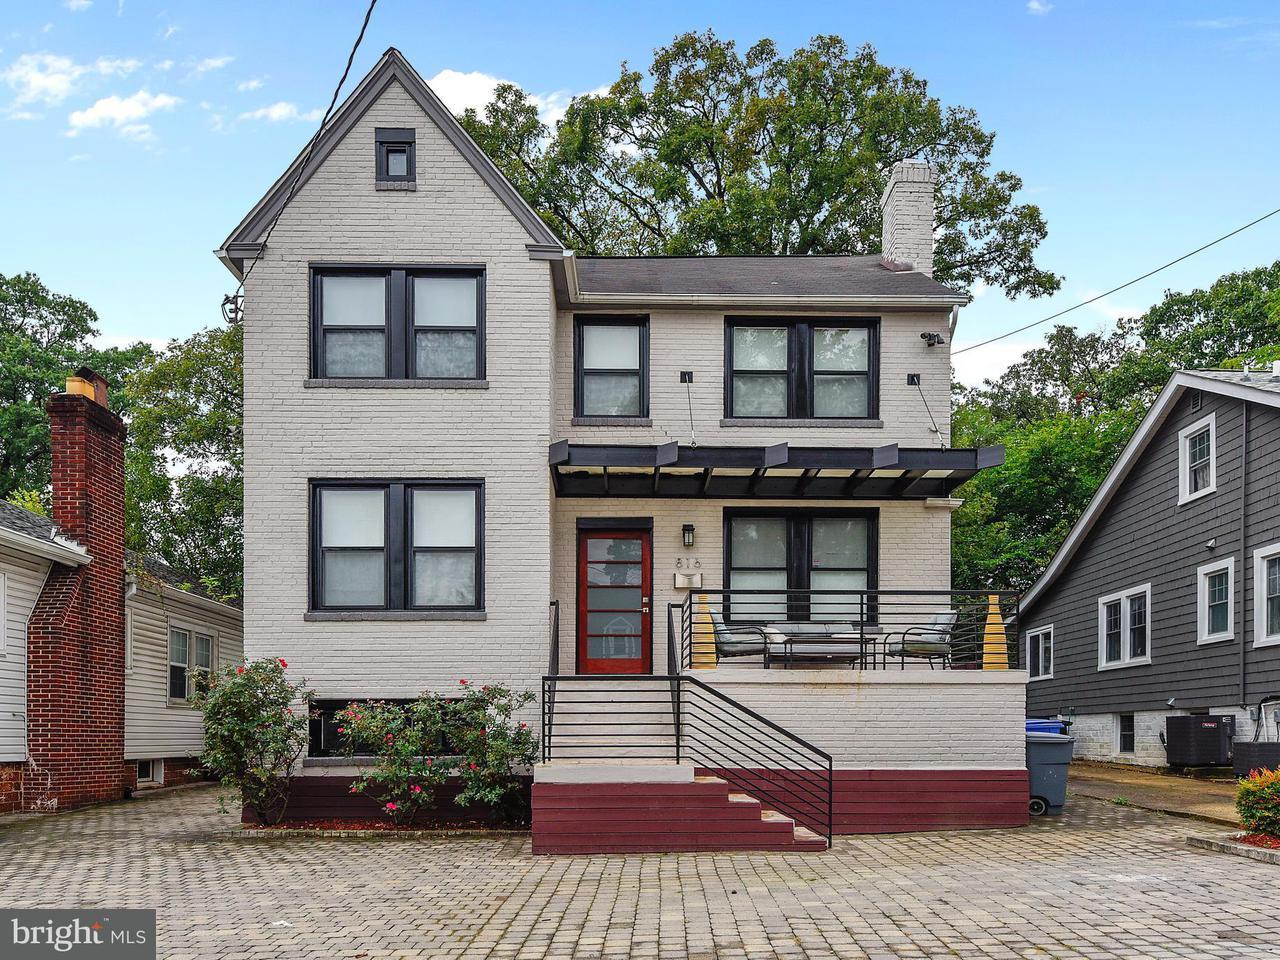 Single Family Home for Sale at 816 PHILADELPHIA Avenue 816 PHILADELPHIA Avenue Silver Spring, Maryland 20910 United States